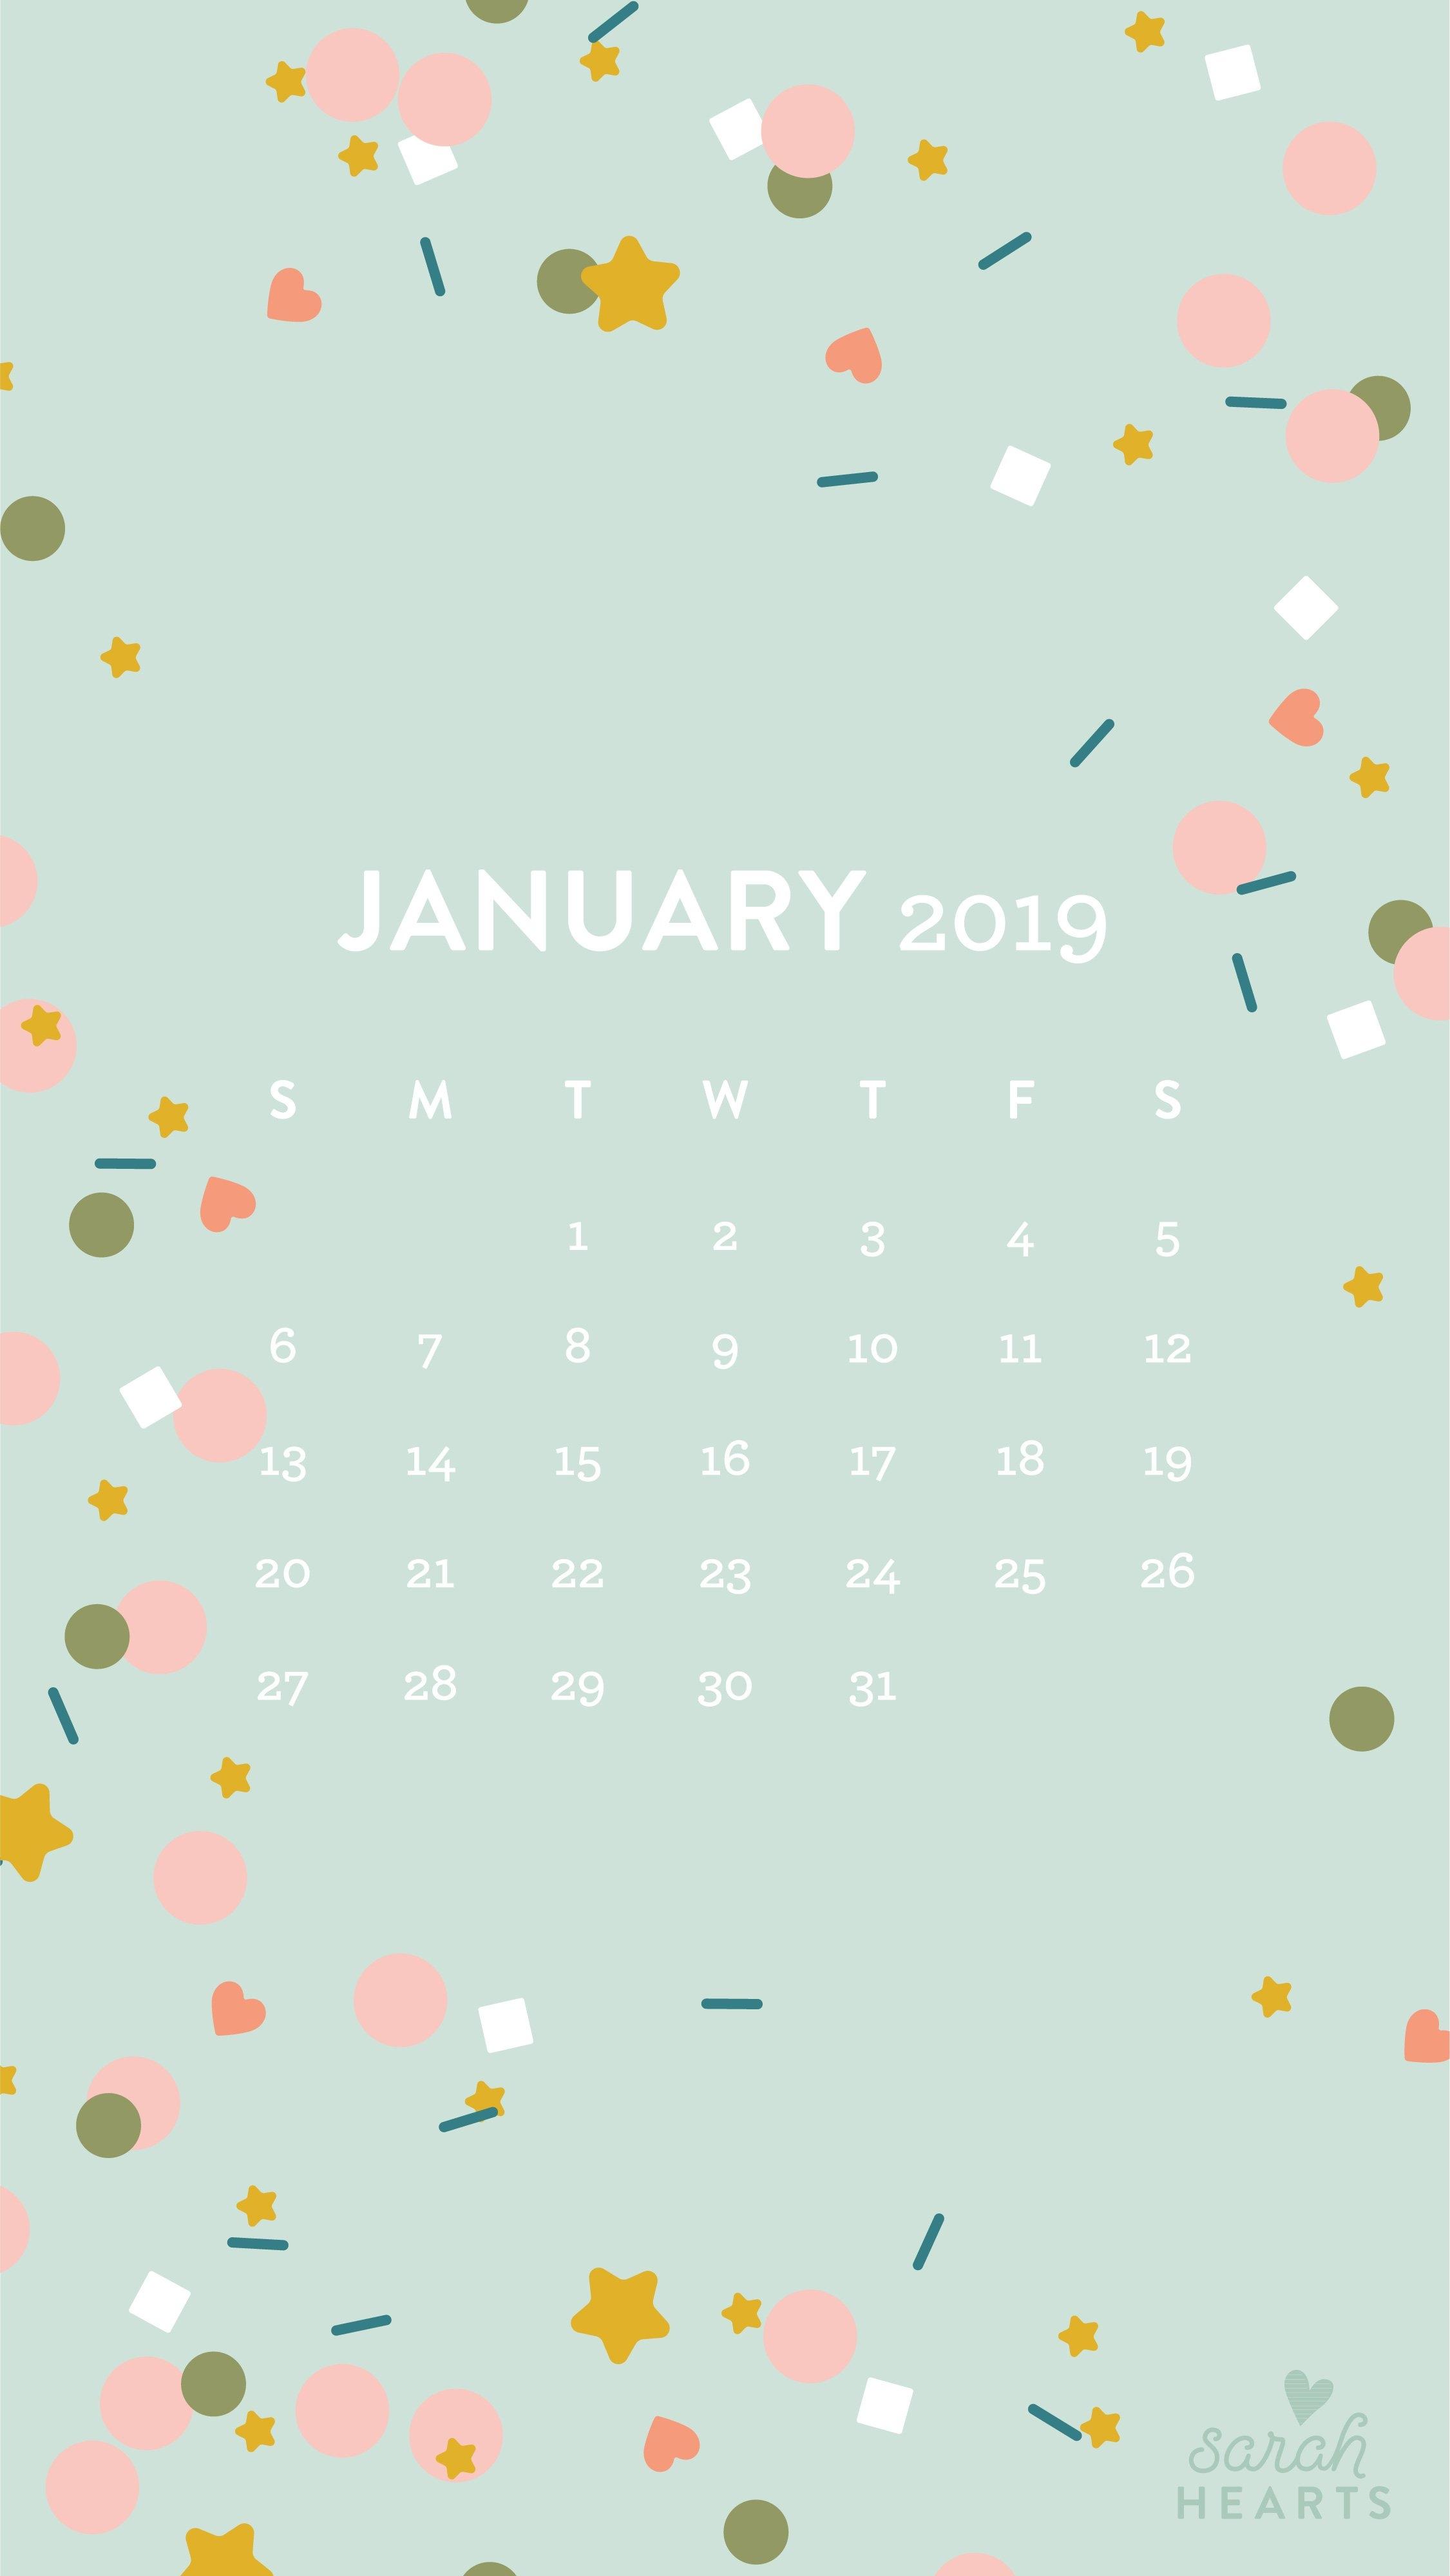 January 2019 Confetti Calendar Wallpaper – Sarah Hearts Calendar 2019 On My Iphone